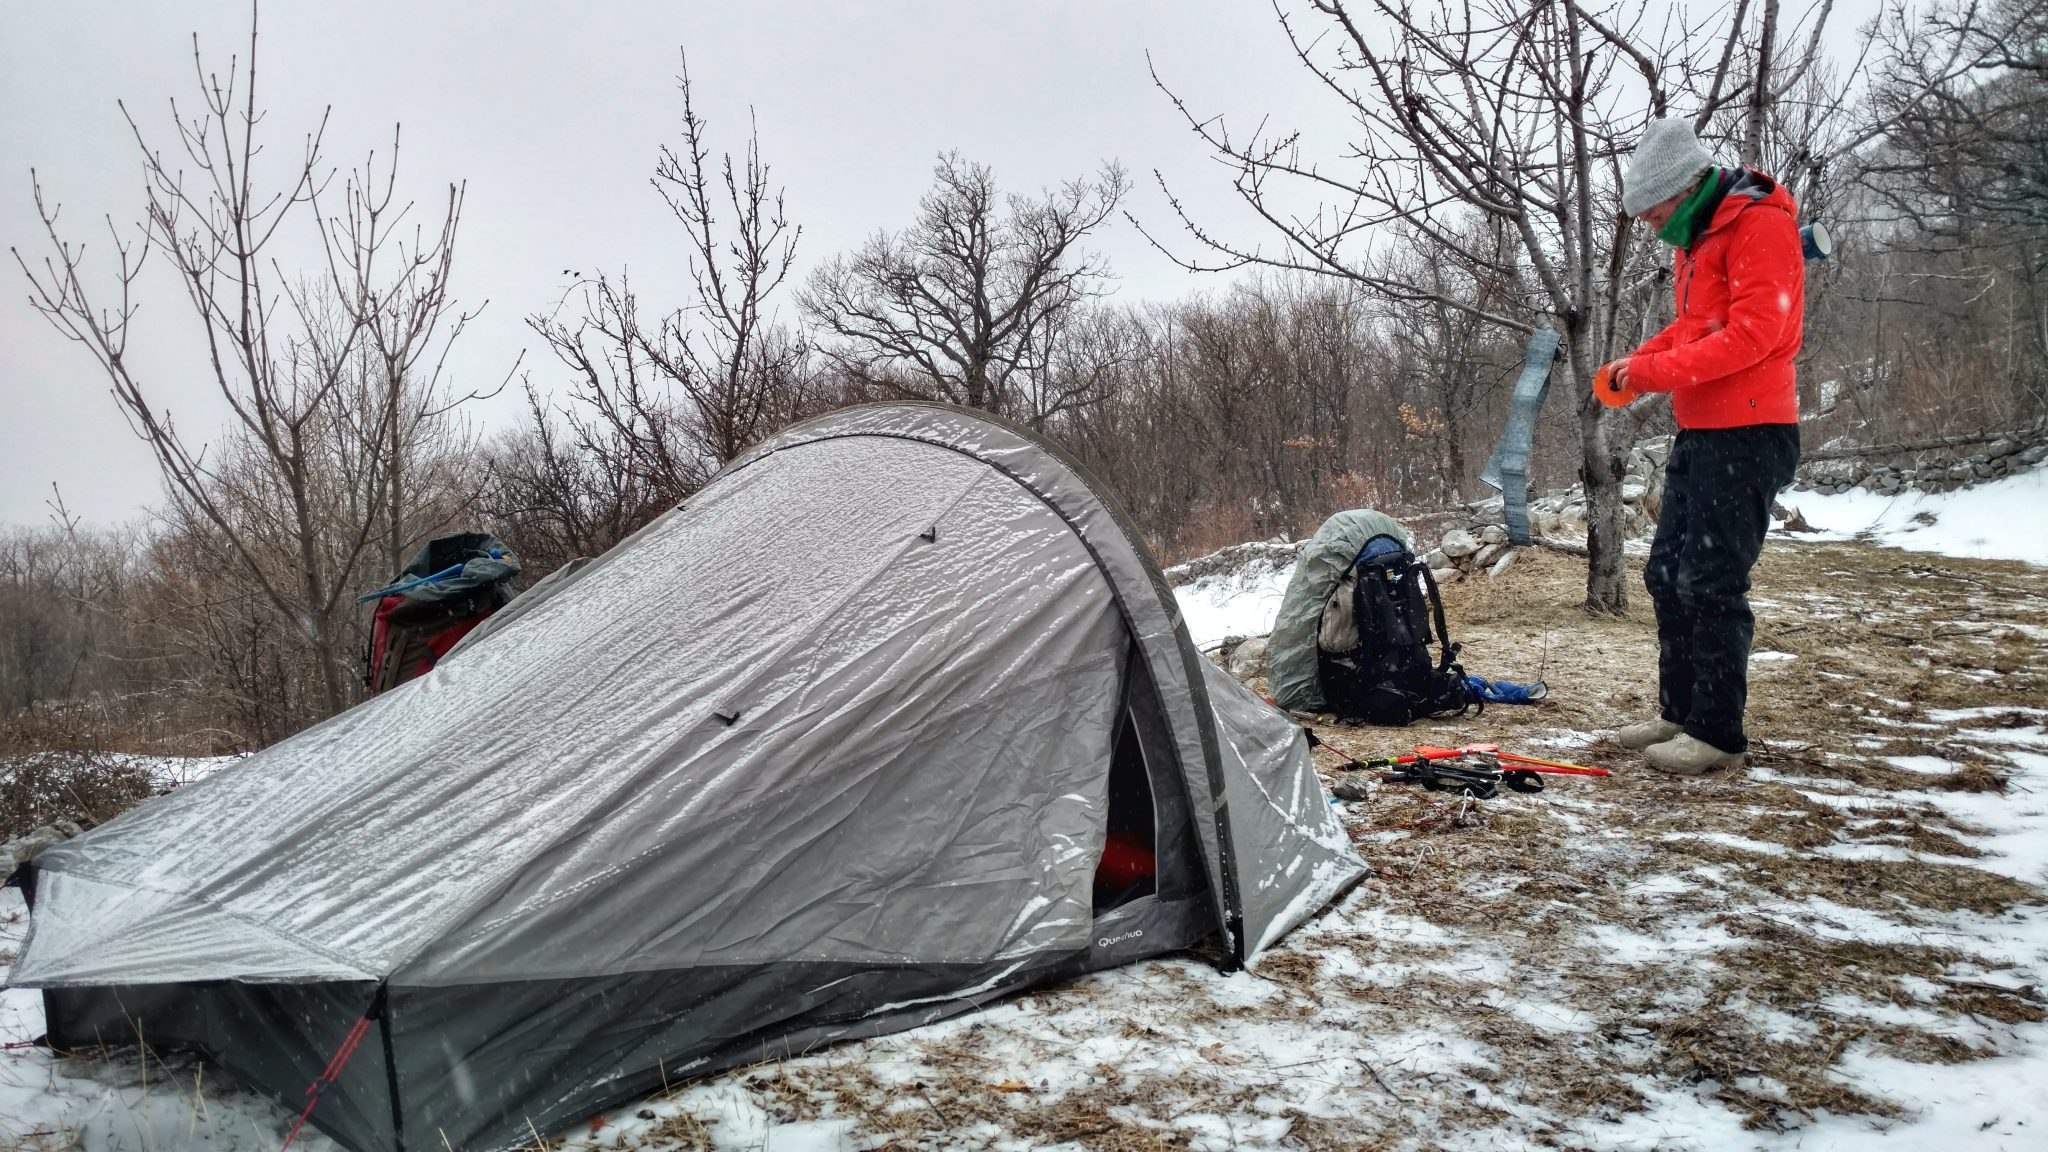 Velebit Winter Hike Day 2 | B(rrrr)eautiful bivouac